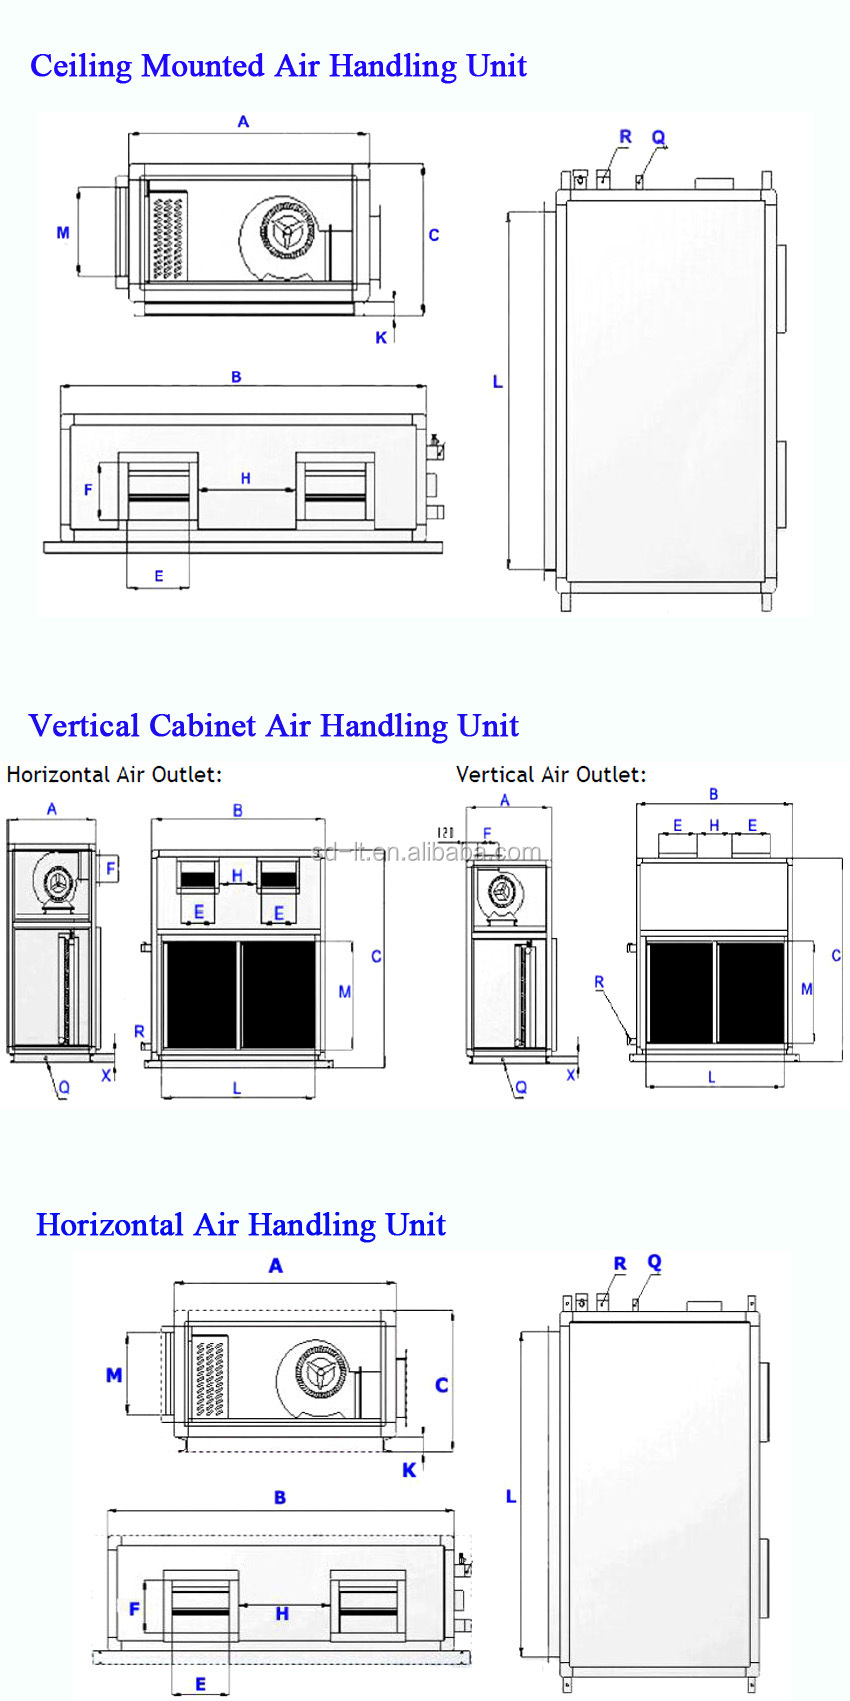 medium resolution of 40 air flow rate 103 m3 h remarks vertical air handling units